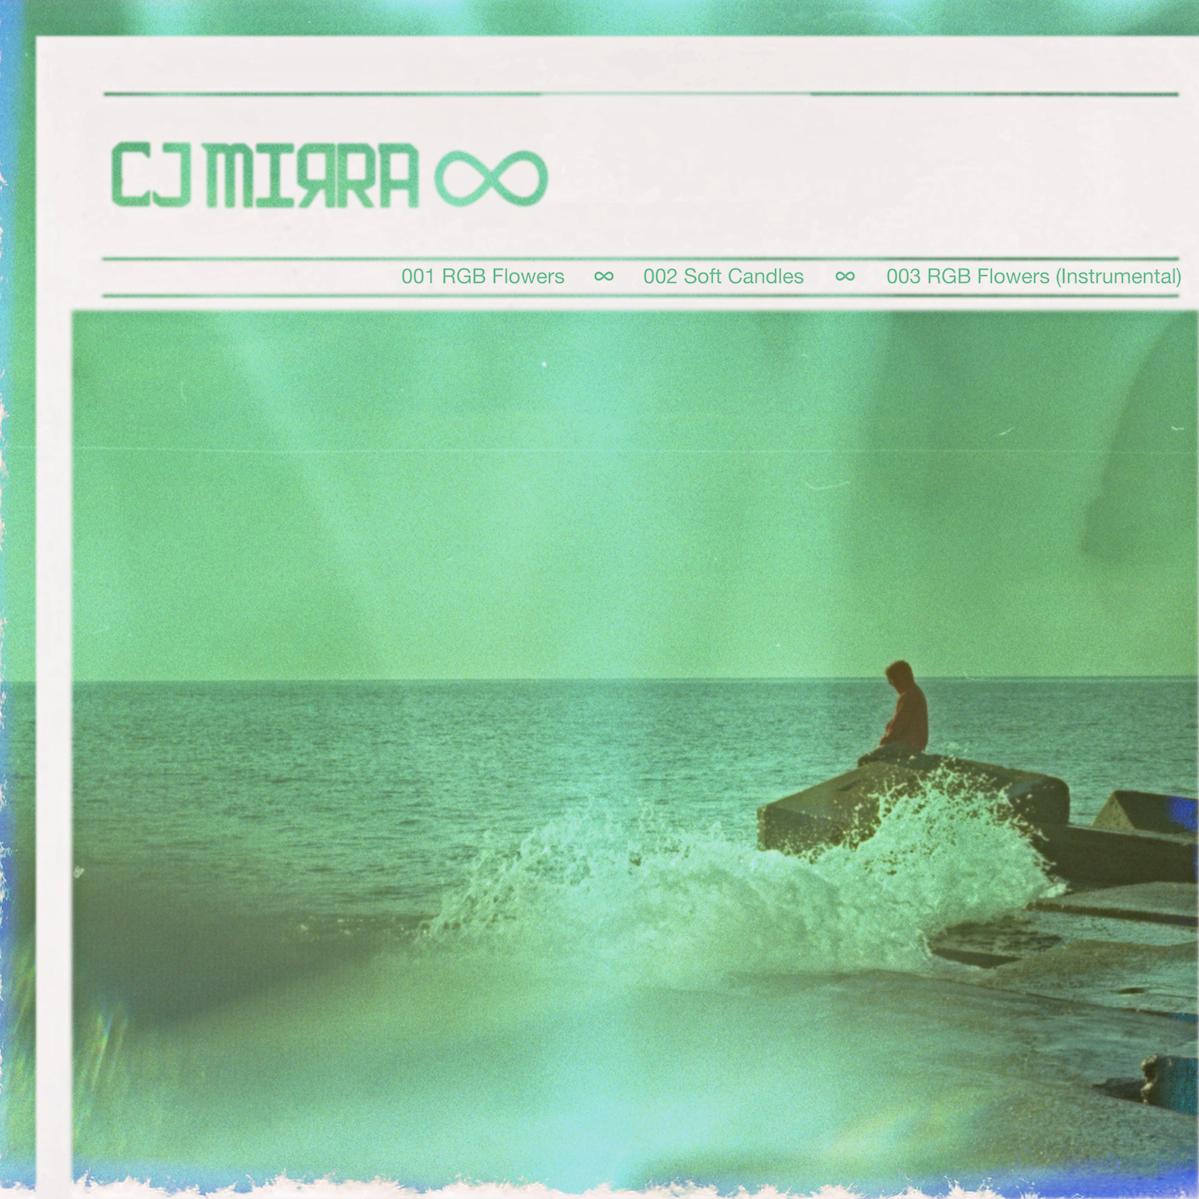 CJ MIRRA - RGB FLOWERS / SOFT CANDLES EP COVER ART